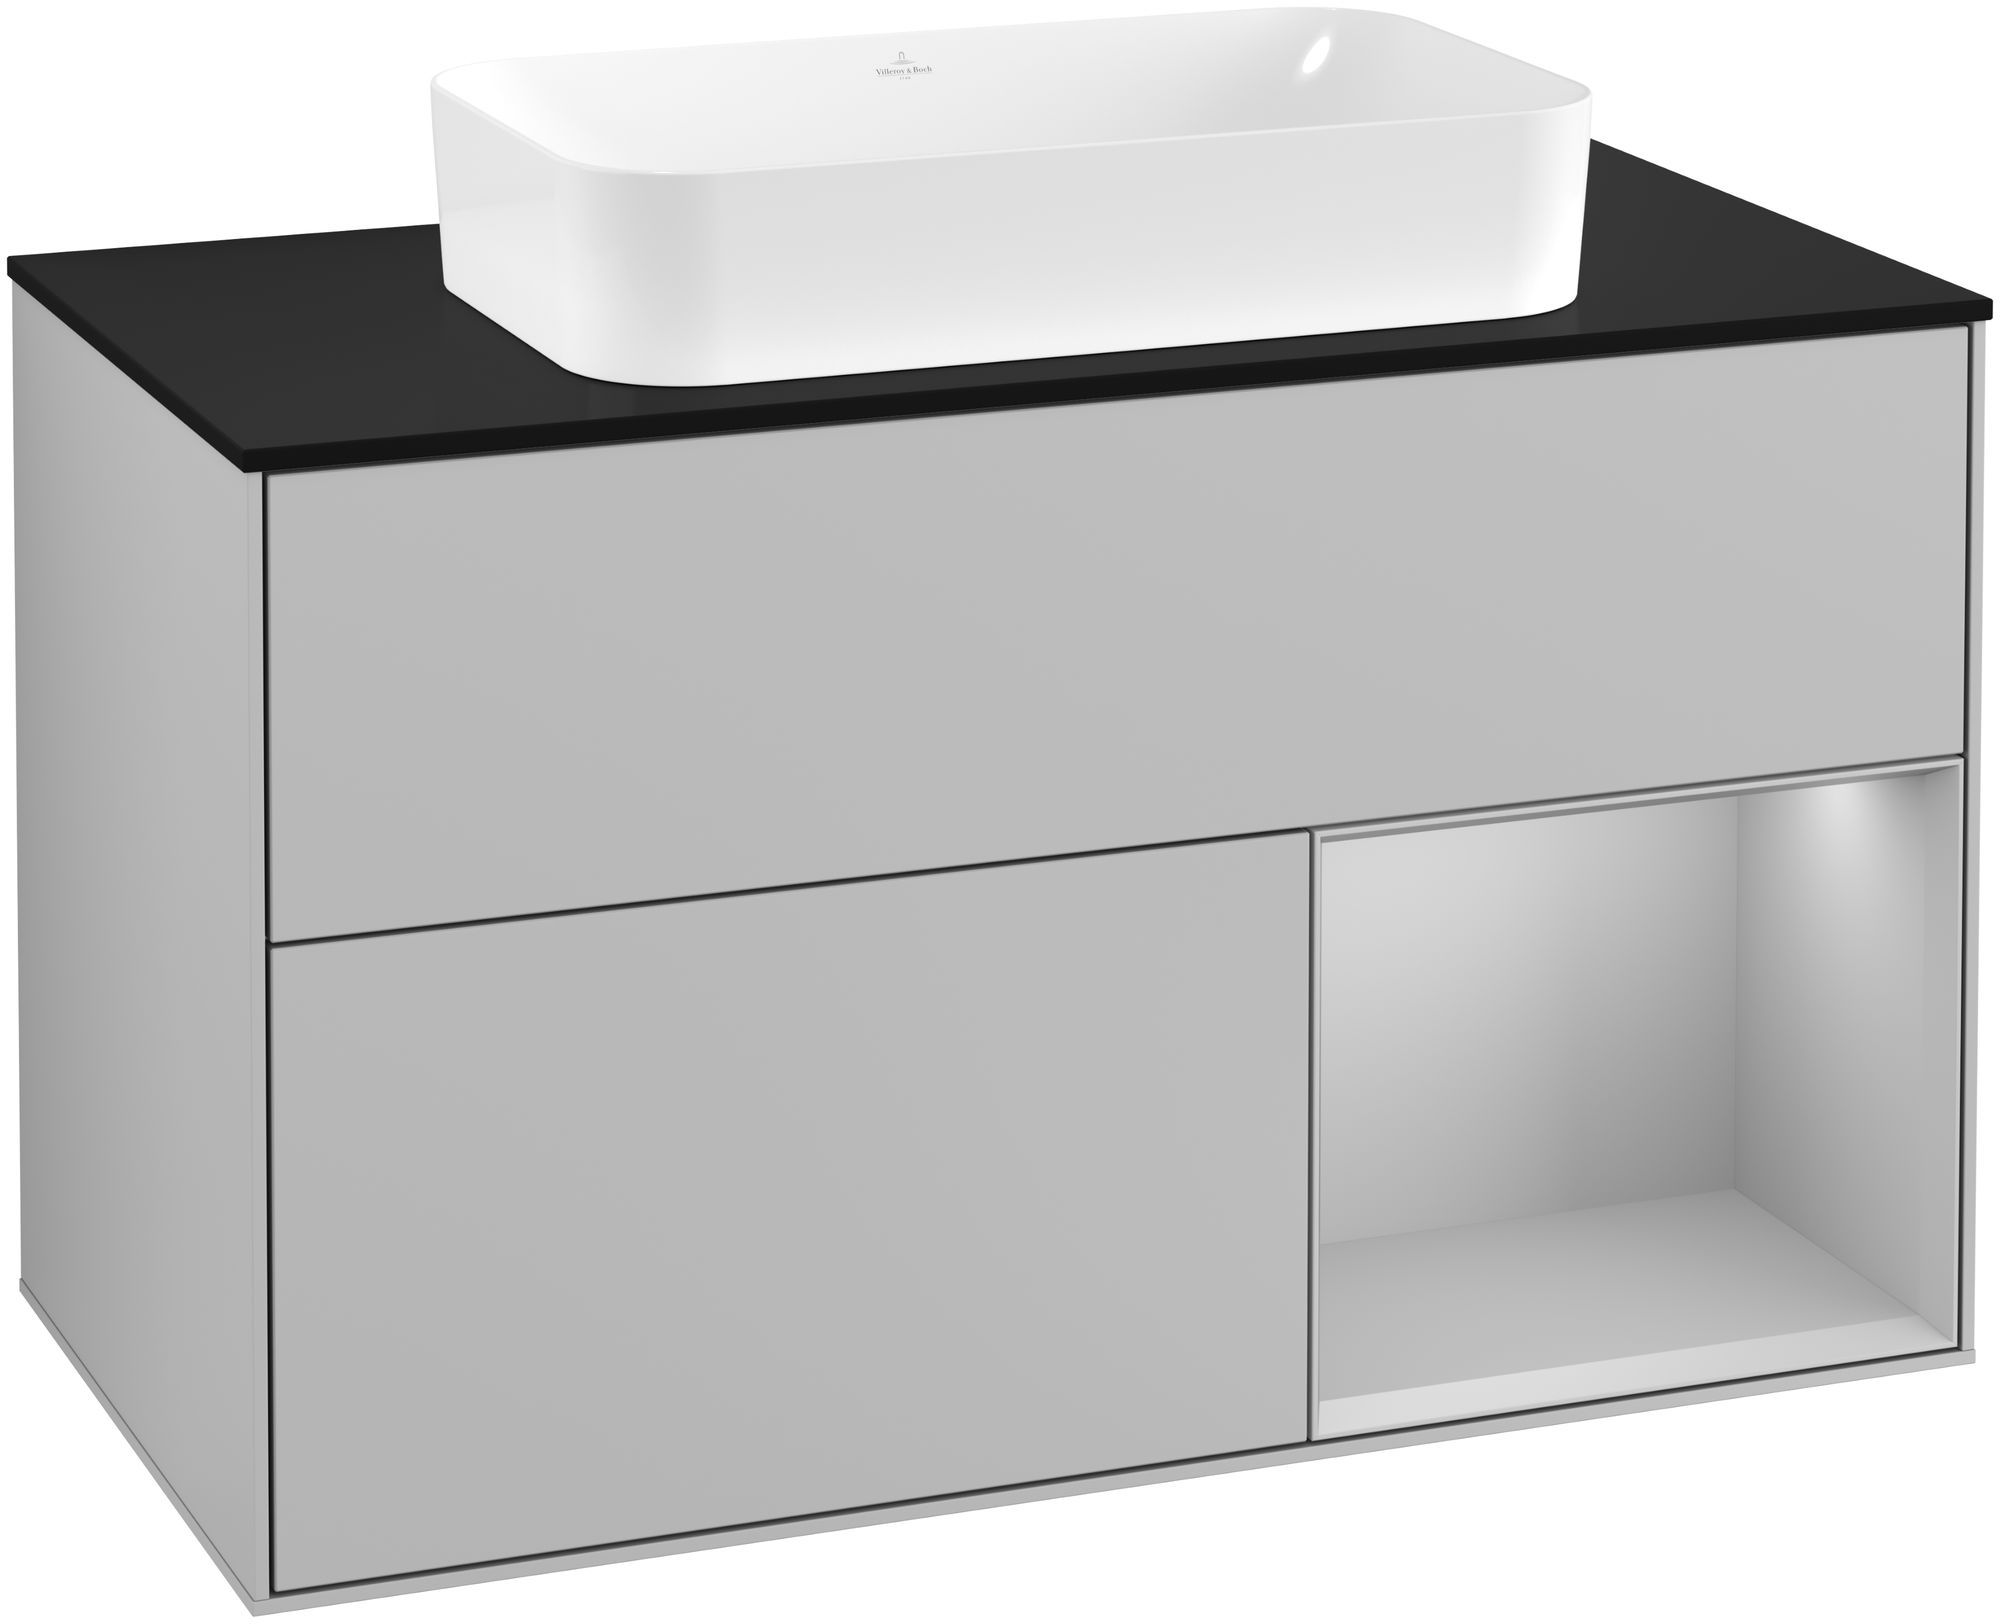 Villeroy & Boch Finion G25 Waschtischunterschrank mit Regalelement 2 Auszüge Waschtisch mittig LED-Beleuchtung B:100xH:60,3xT:50,1cm Front, Korpus: Light Grey Matt, Glasplatte: Black Matt G252GJGJ